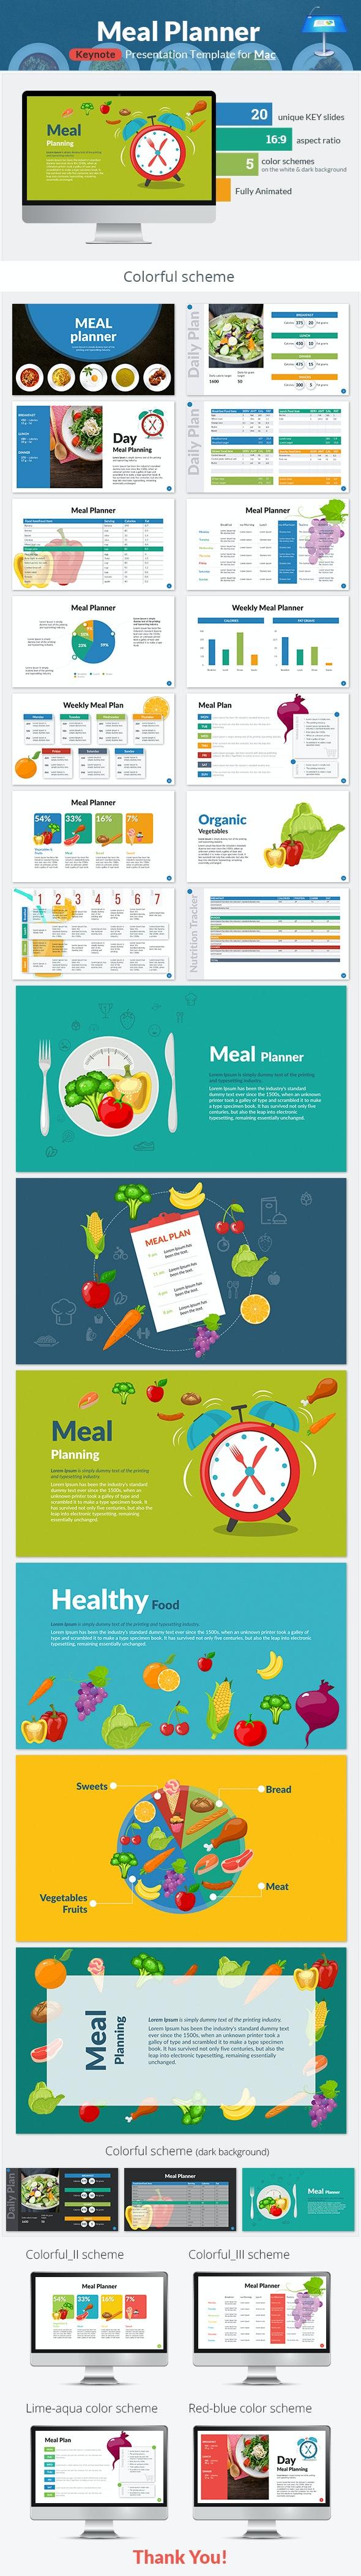 Meal Planner Keynote Presentation Template - Keynote Templates Presentation Templates